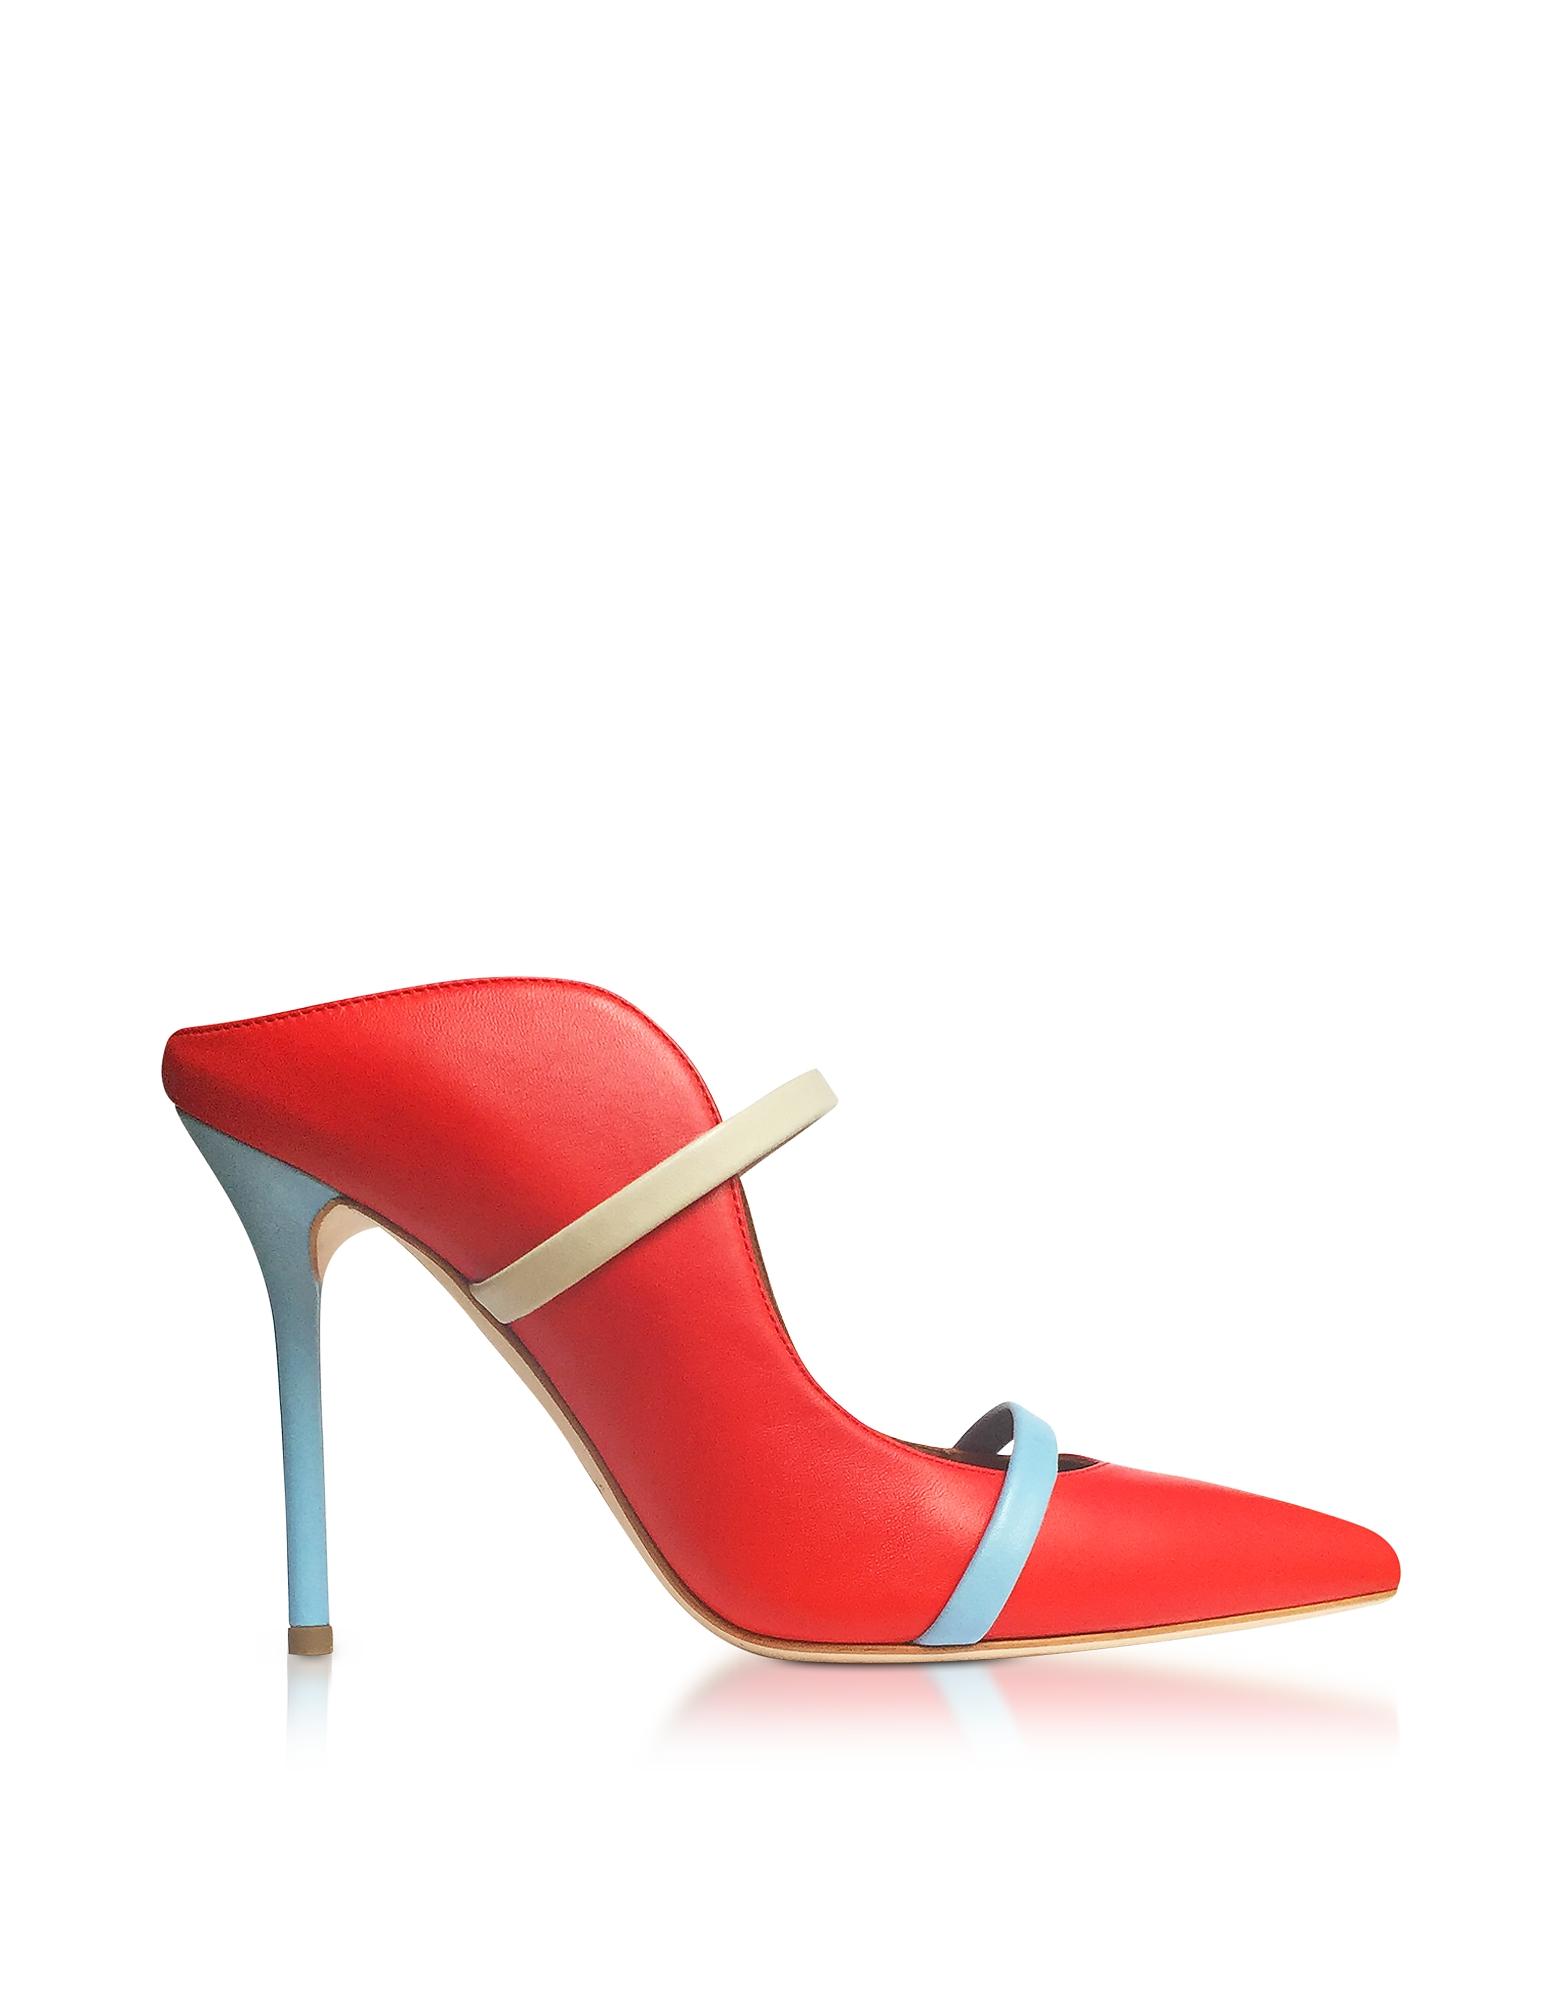 Rouge feu, la Glace et la Poudre Bleu Nappa Maureen High Heel Mules